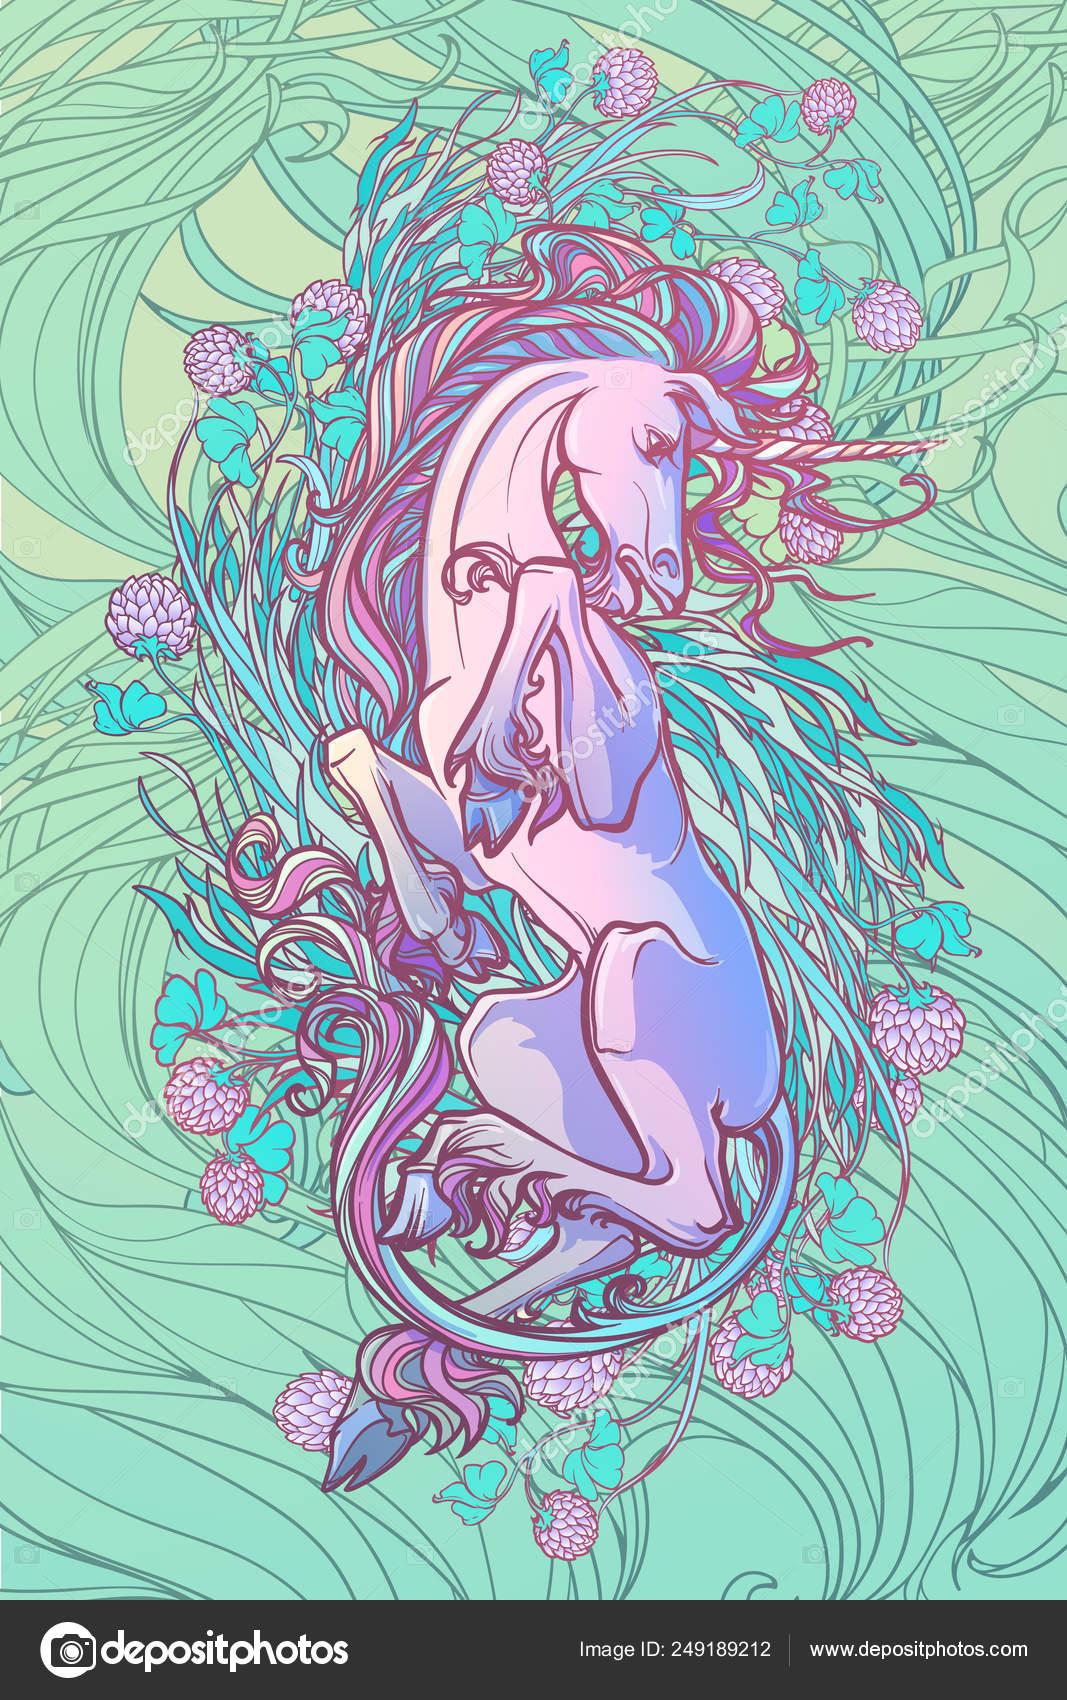 Unicornio En La Espalda Fantasía Arte Conceptual Para Tatuaje Logo